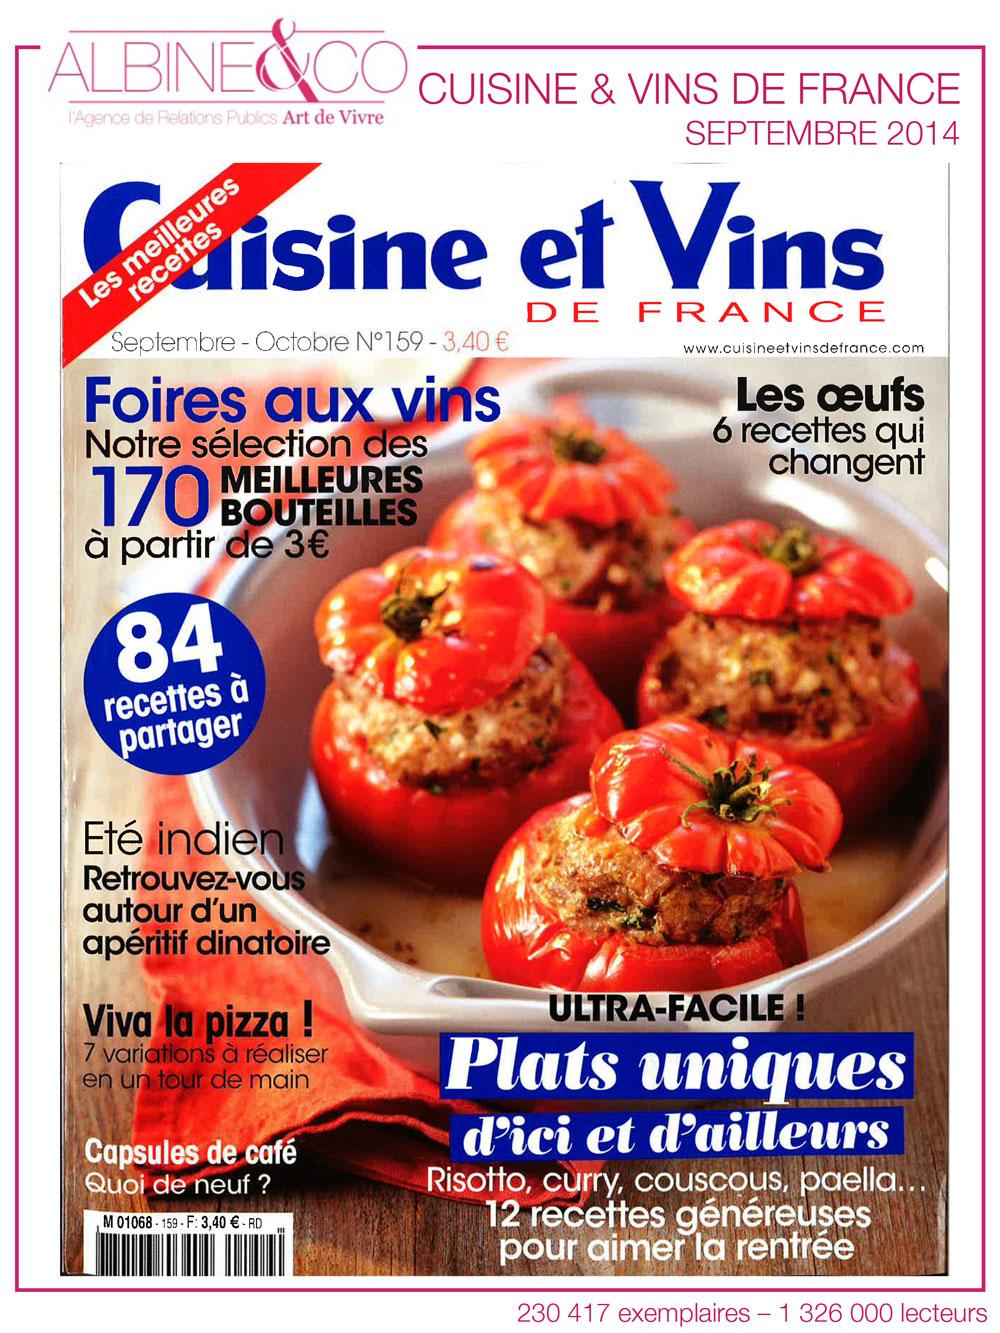 Mas De Cynanque Cuisine Et Vins De France Mas De Cynanque